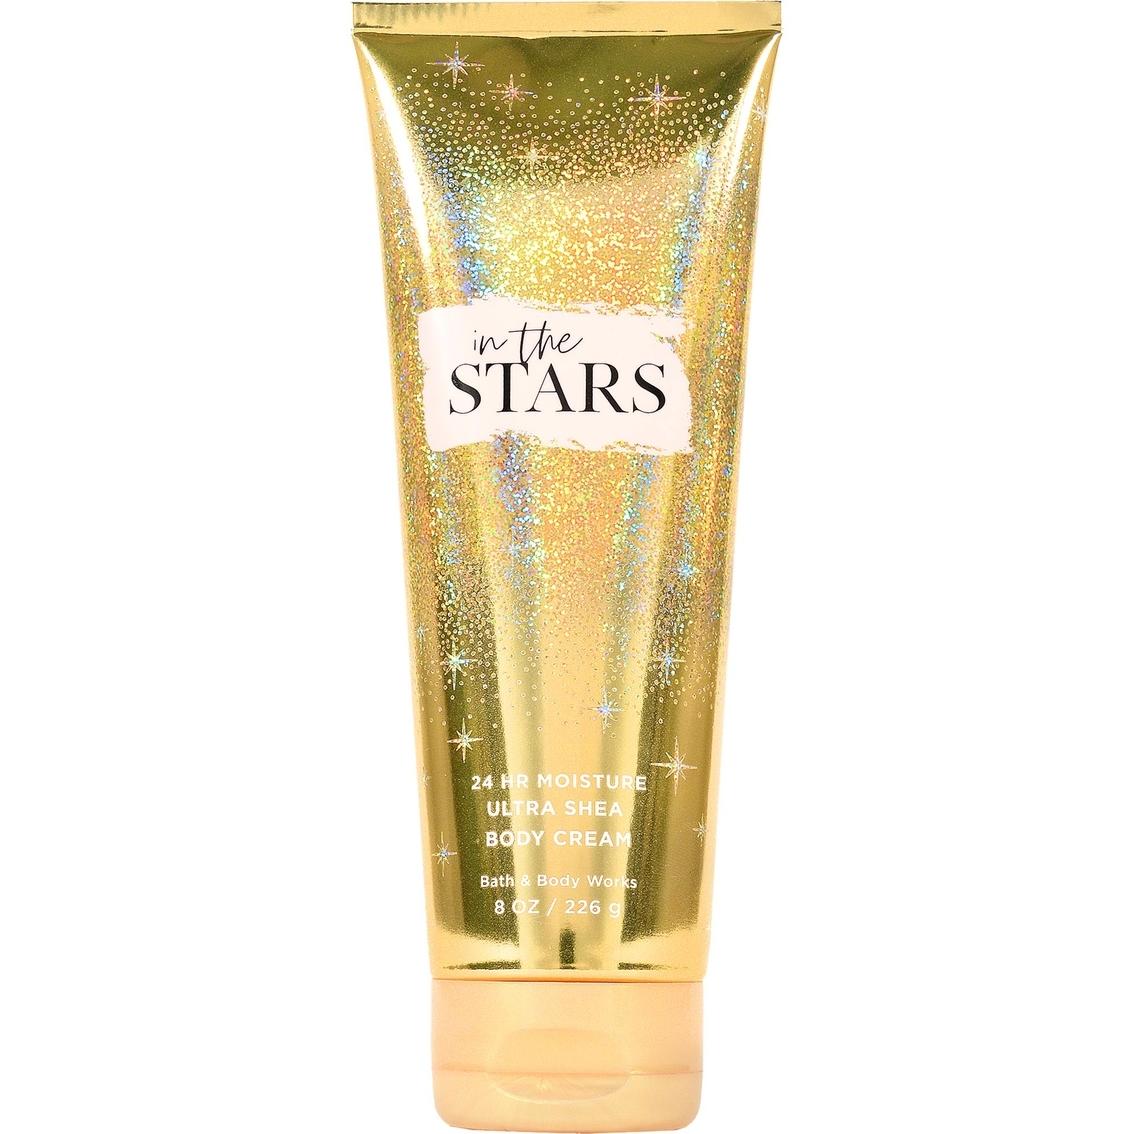 Крем для тела Bath&BodyWorks In The Stars 226 гр